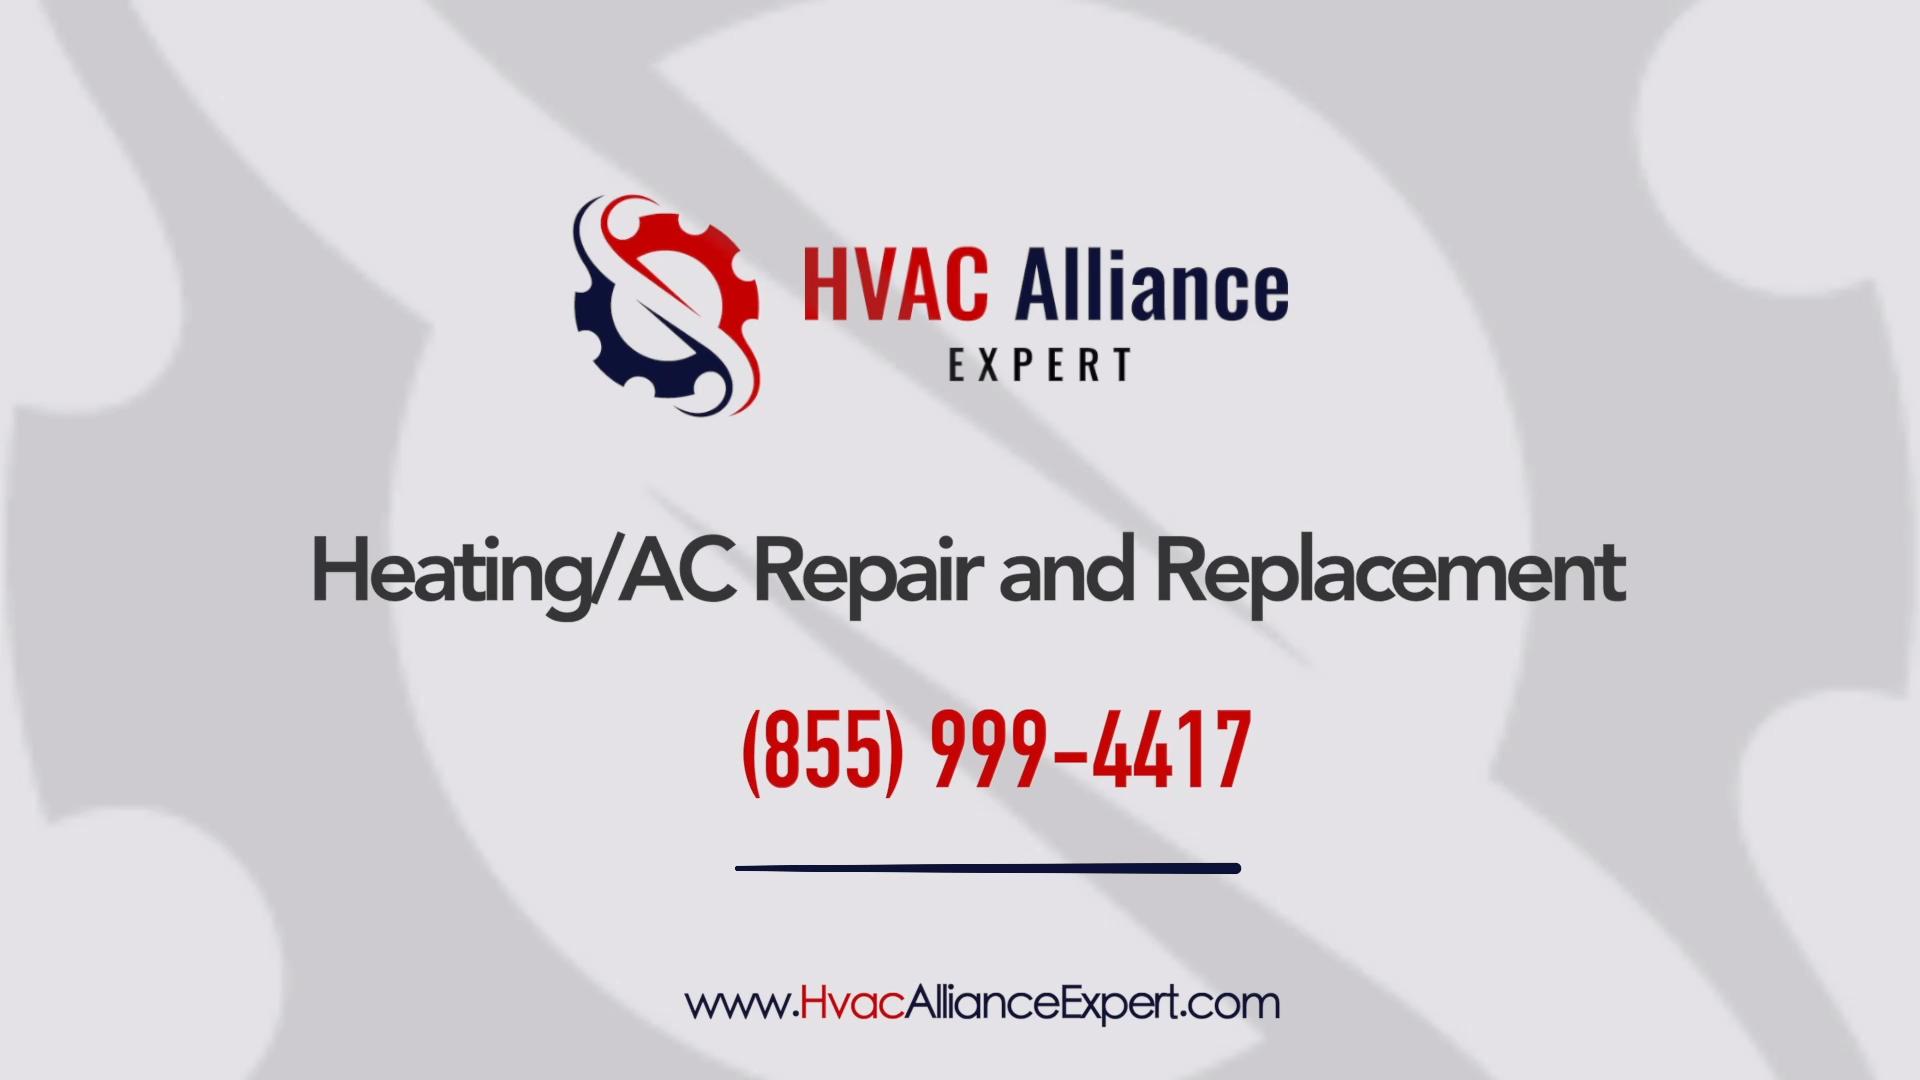 Pin By Hvac Alliance Expert On Hvac Alliance Expert Video Ac Repair Alliance Repair